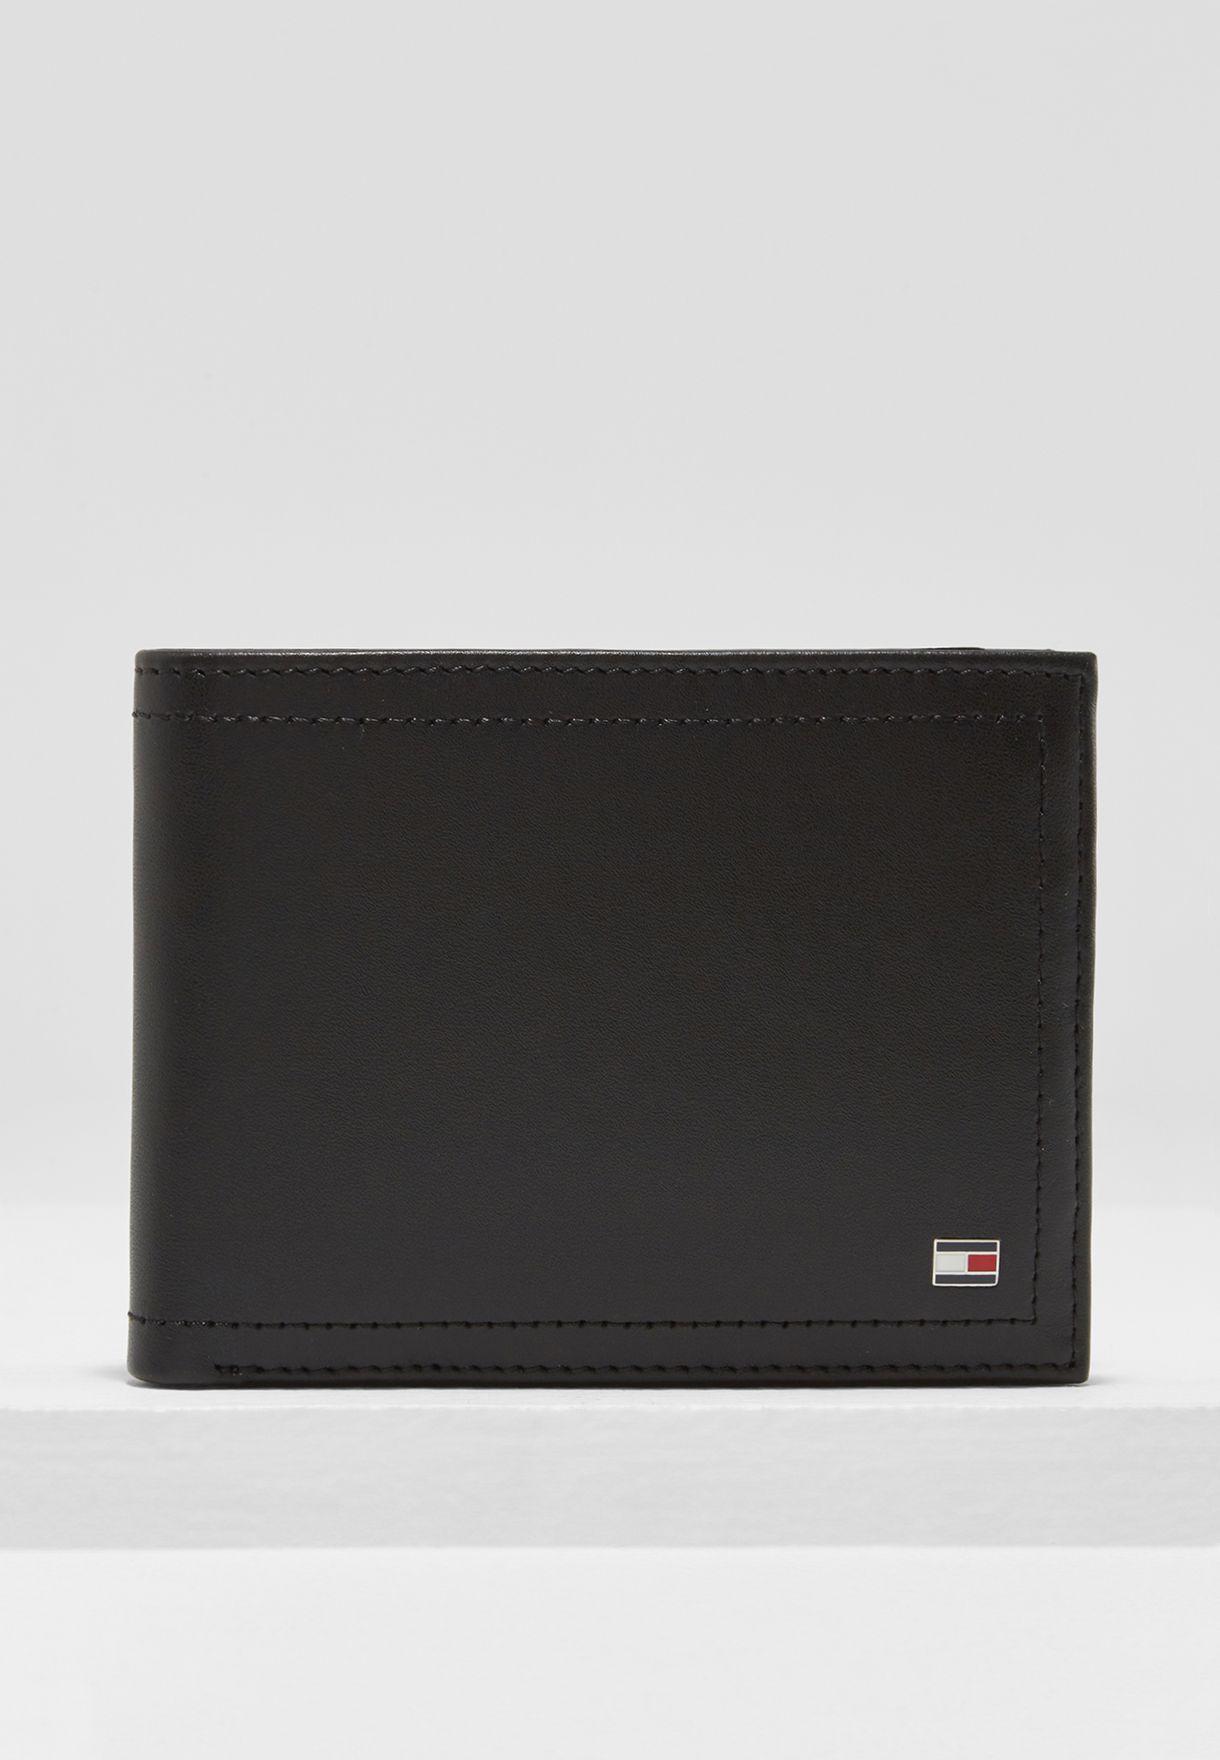 Harry Coin Pocket Wallet